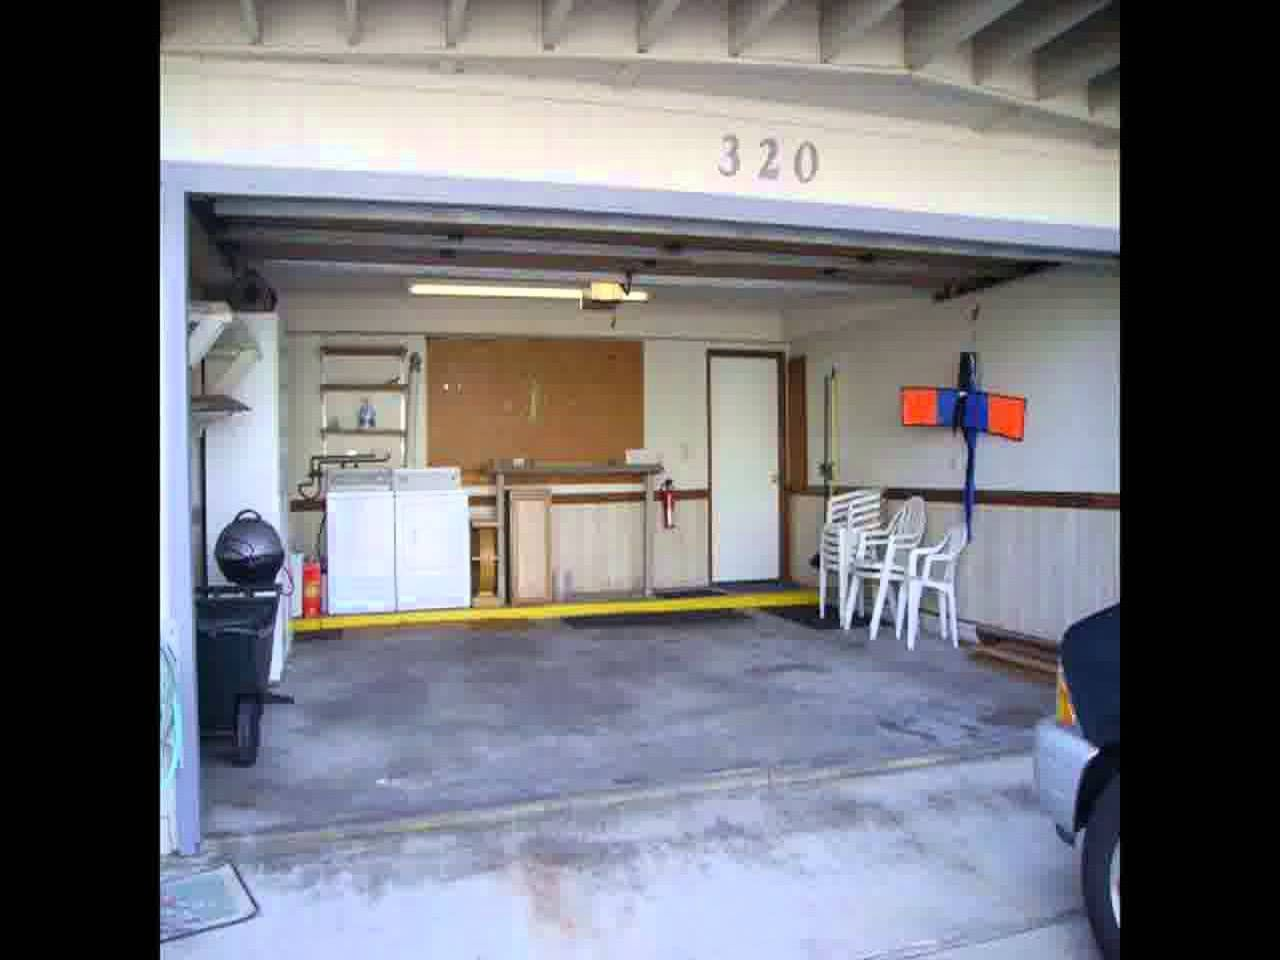 Cheap Garage Door Ideas Pictures Metal Garage Ideas 88865237 Car Guy Home Decor How To Change Your Garage To Meet Your Needs With Images Garage Design Garage Decor